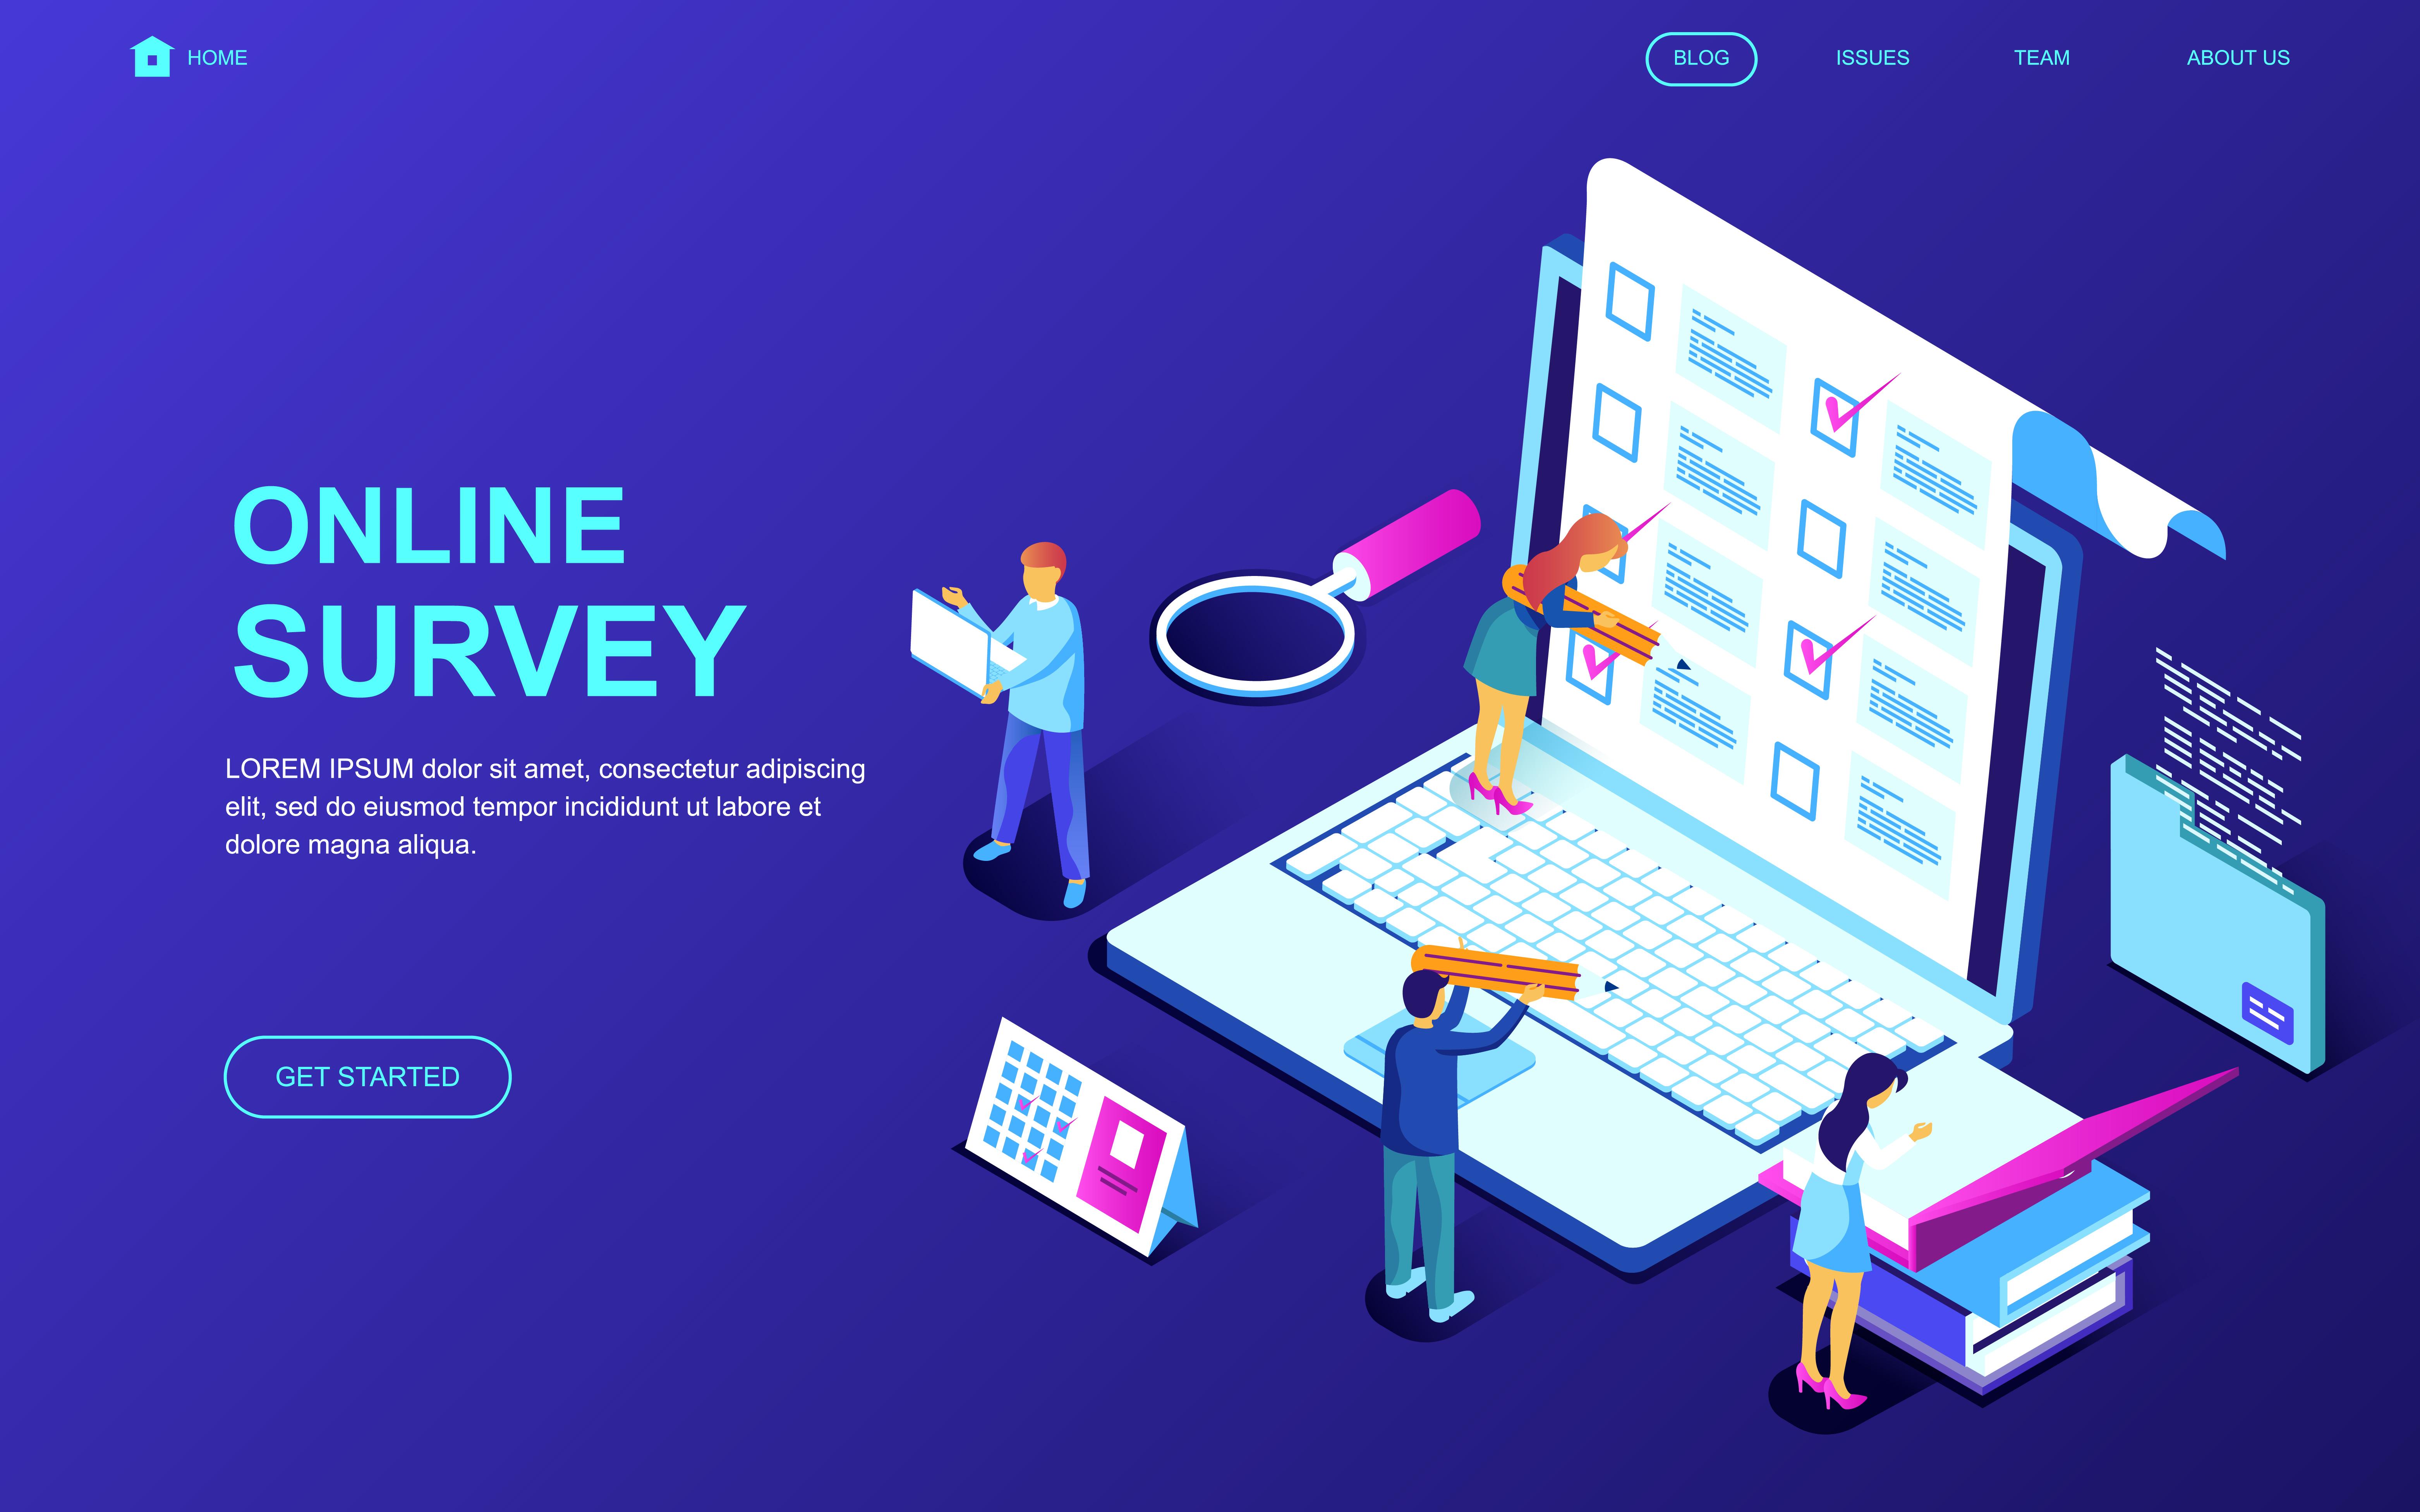 online survey web banner